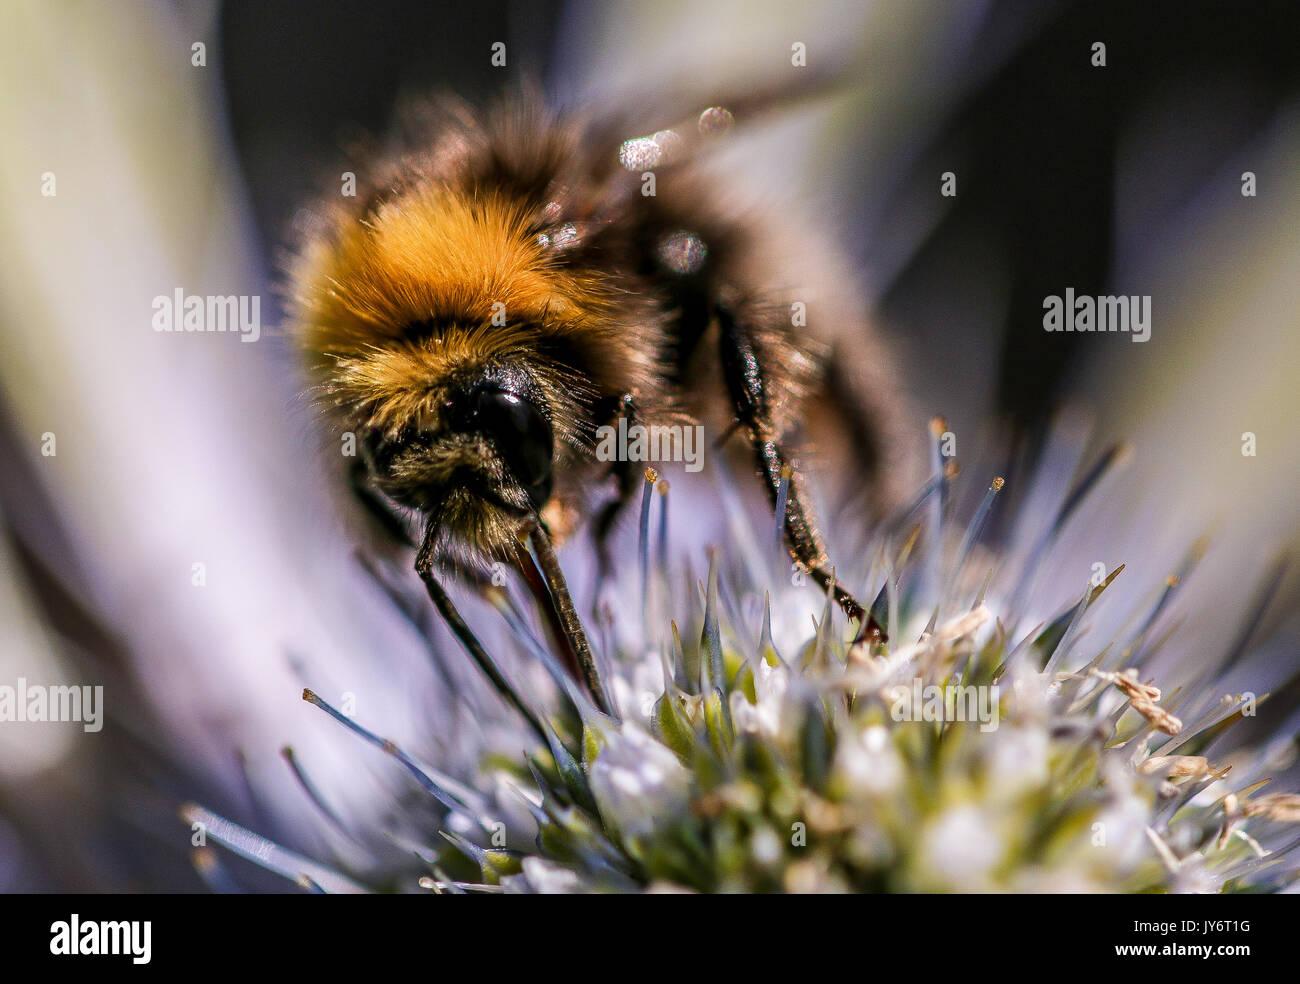 A close up of Honey Bee getting pollen from Eryngium flower head, Shepperton, Surrey, England U.K. - Stock Image